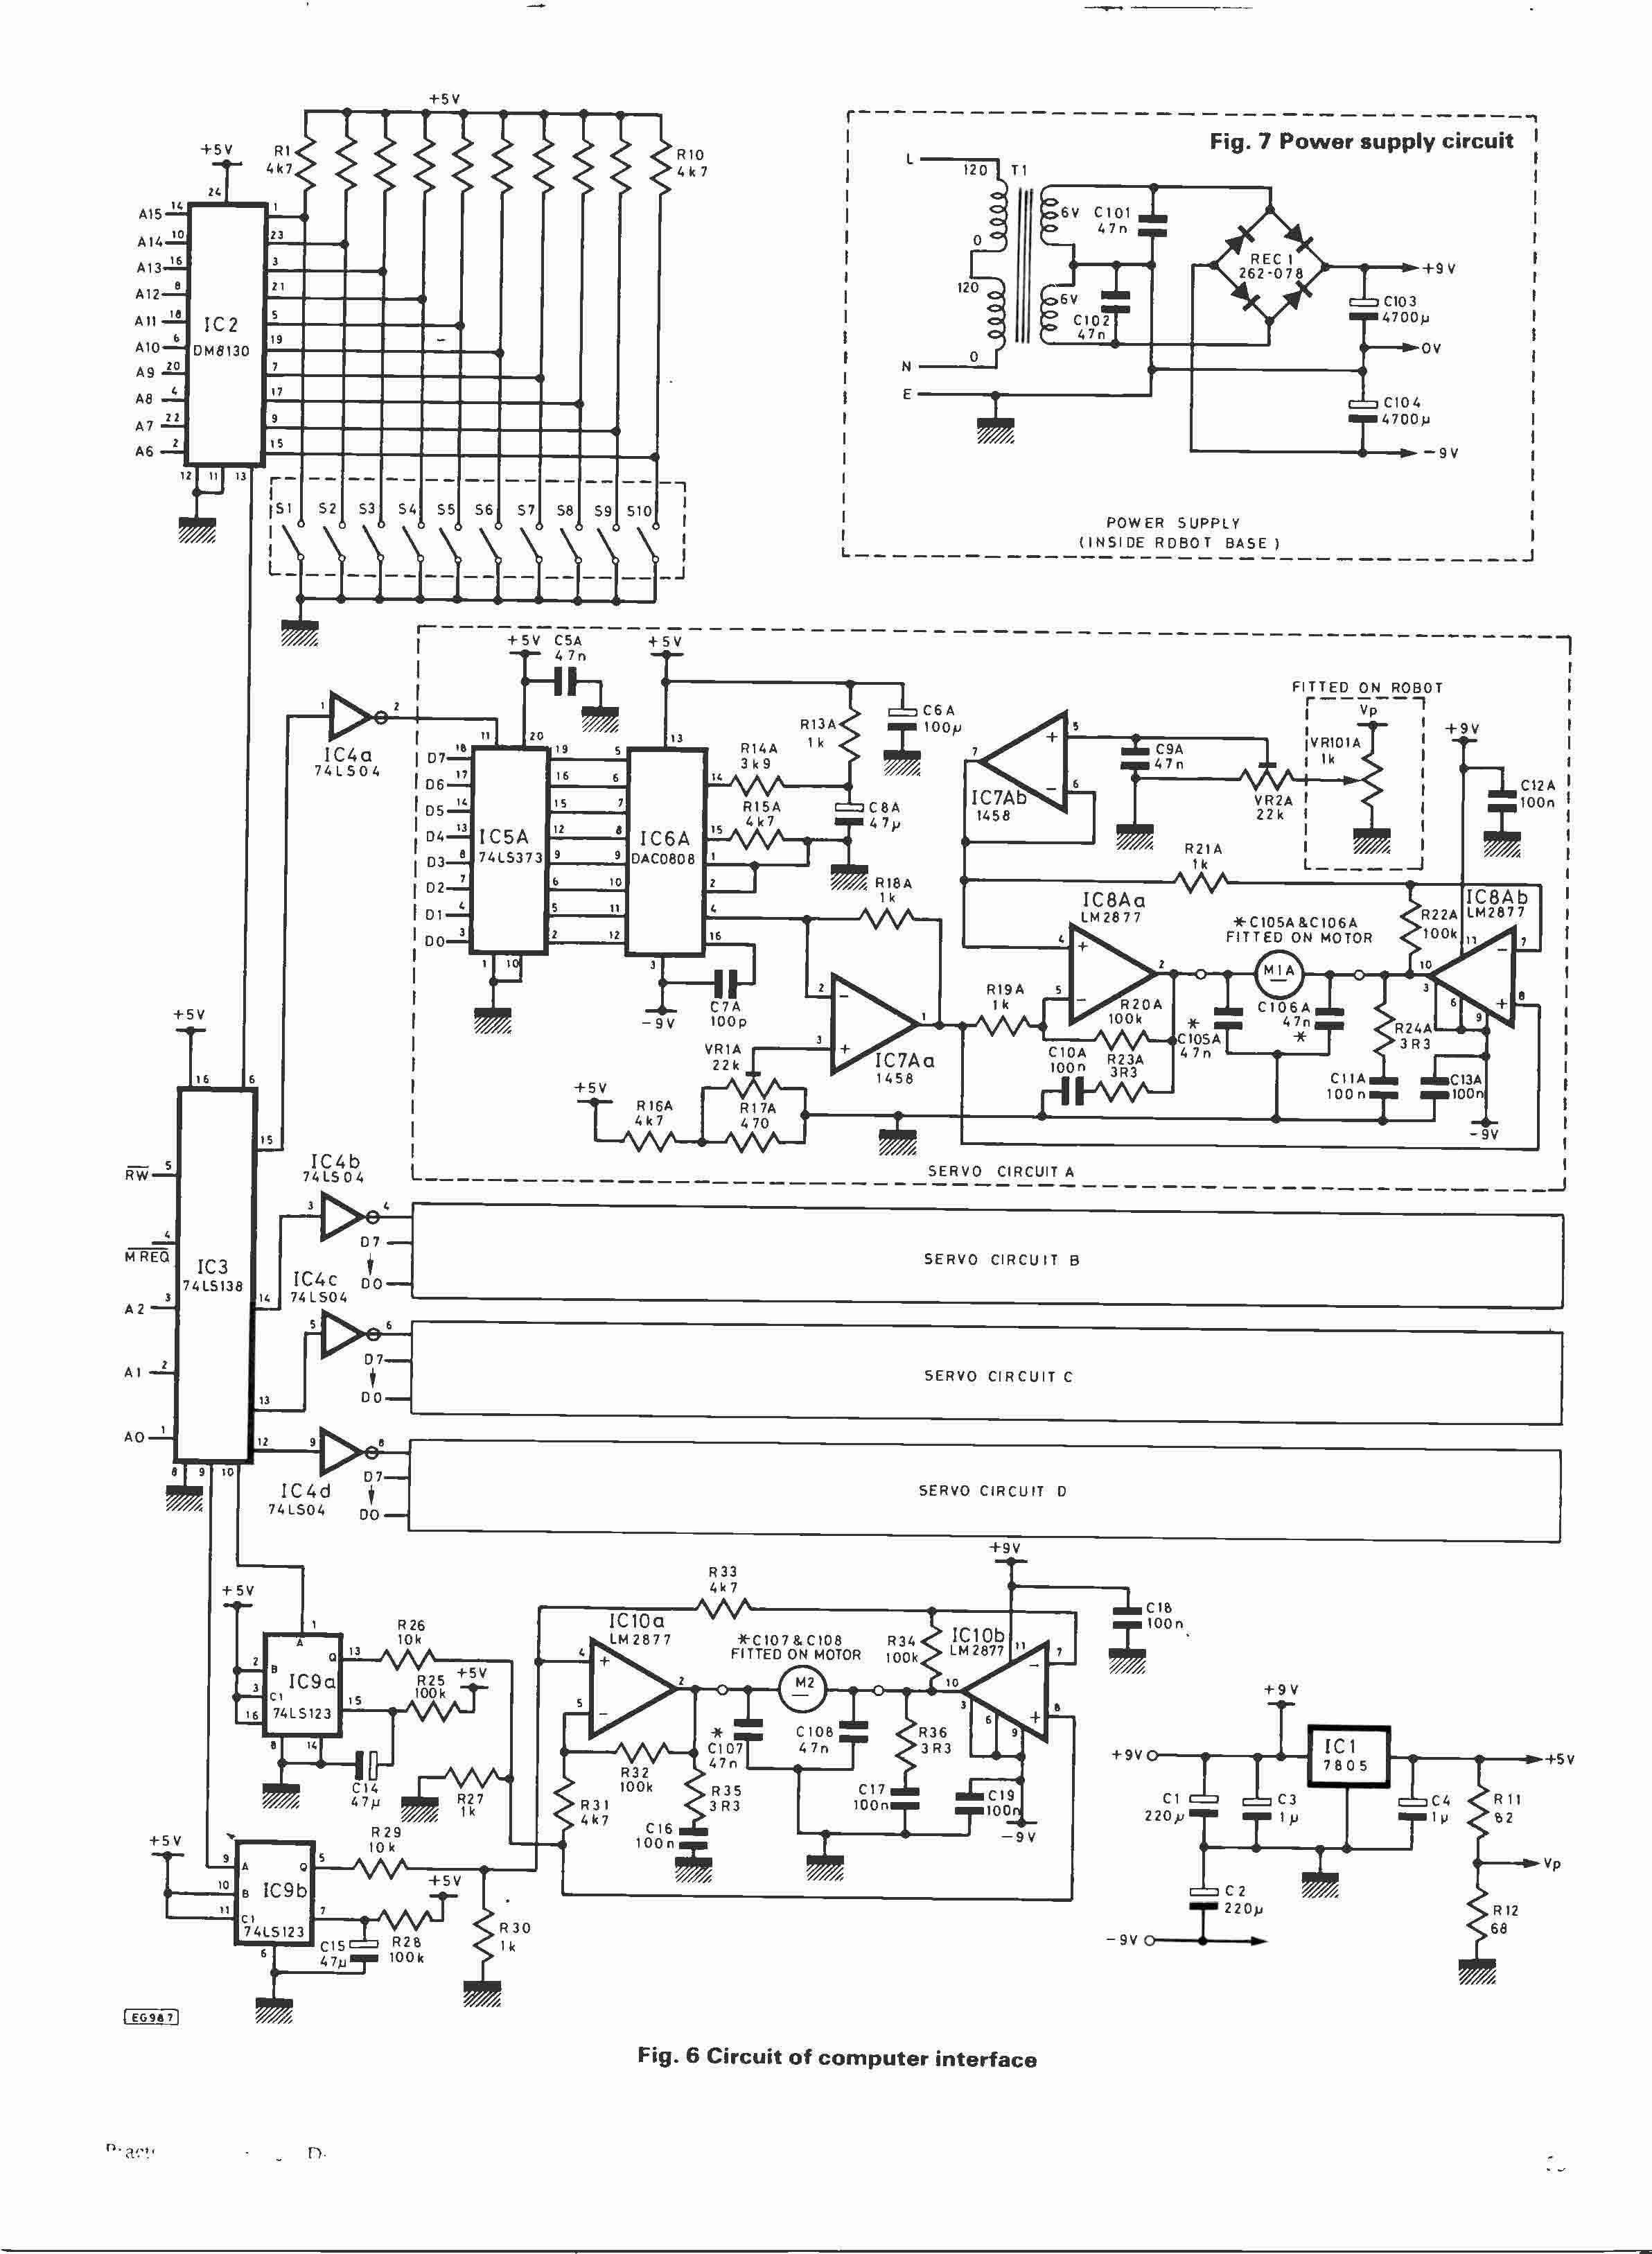 Micrograsp Robotic Arm By Powertran Cybernetics